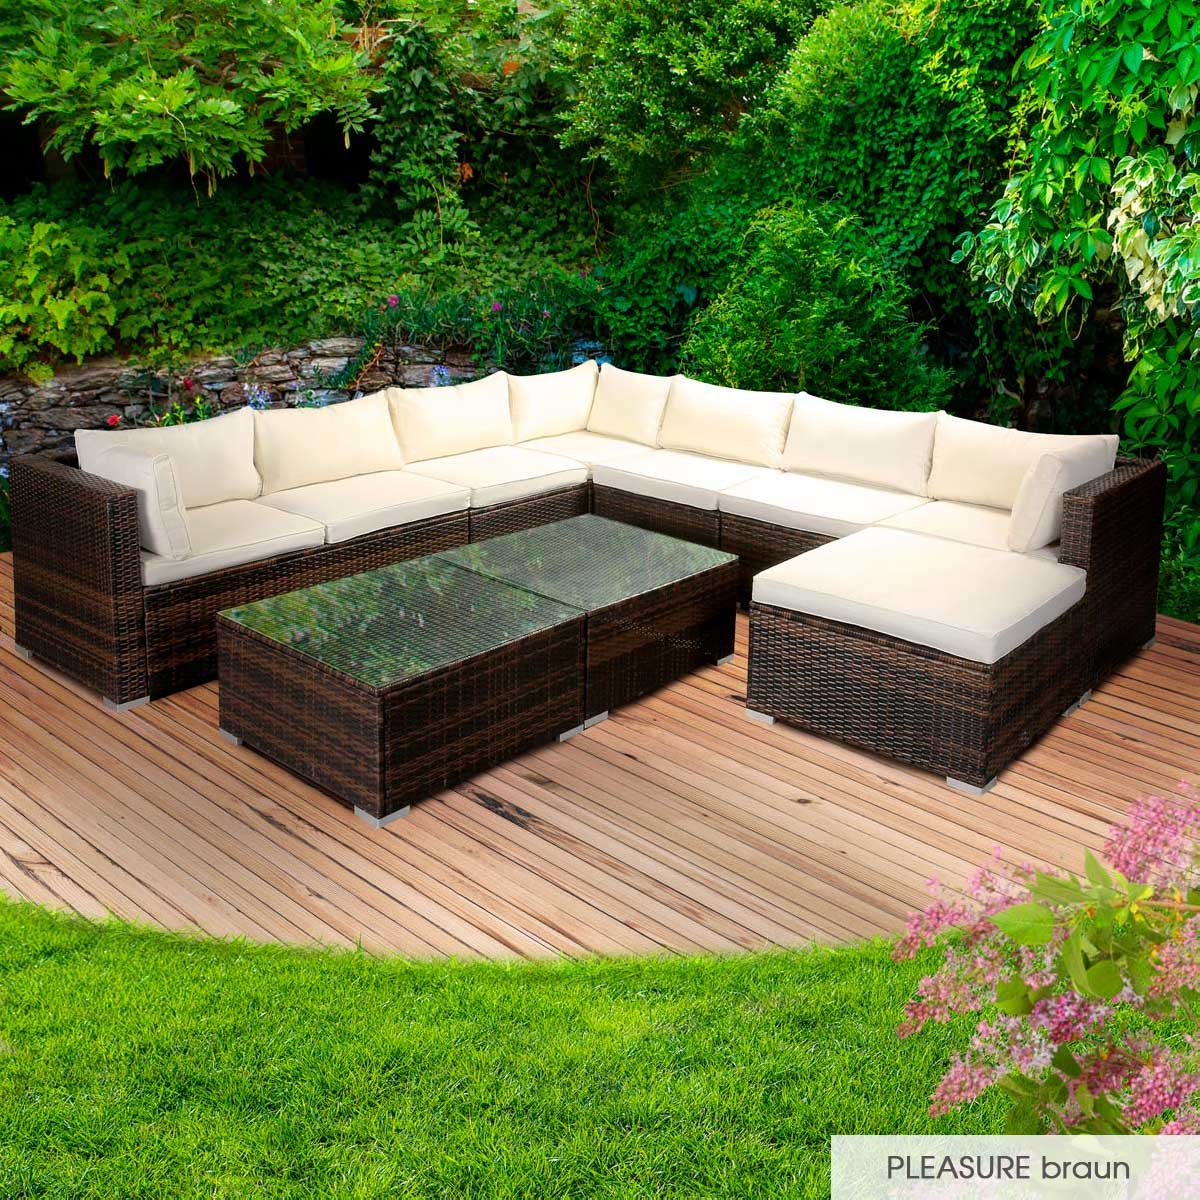 Gartenmoebel-Poly-Rattan-Lounge-Moebel-Sitzgarnitur-Gartengarnitur-Sitzgruppe-Sofa Indexbild 44